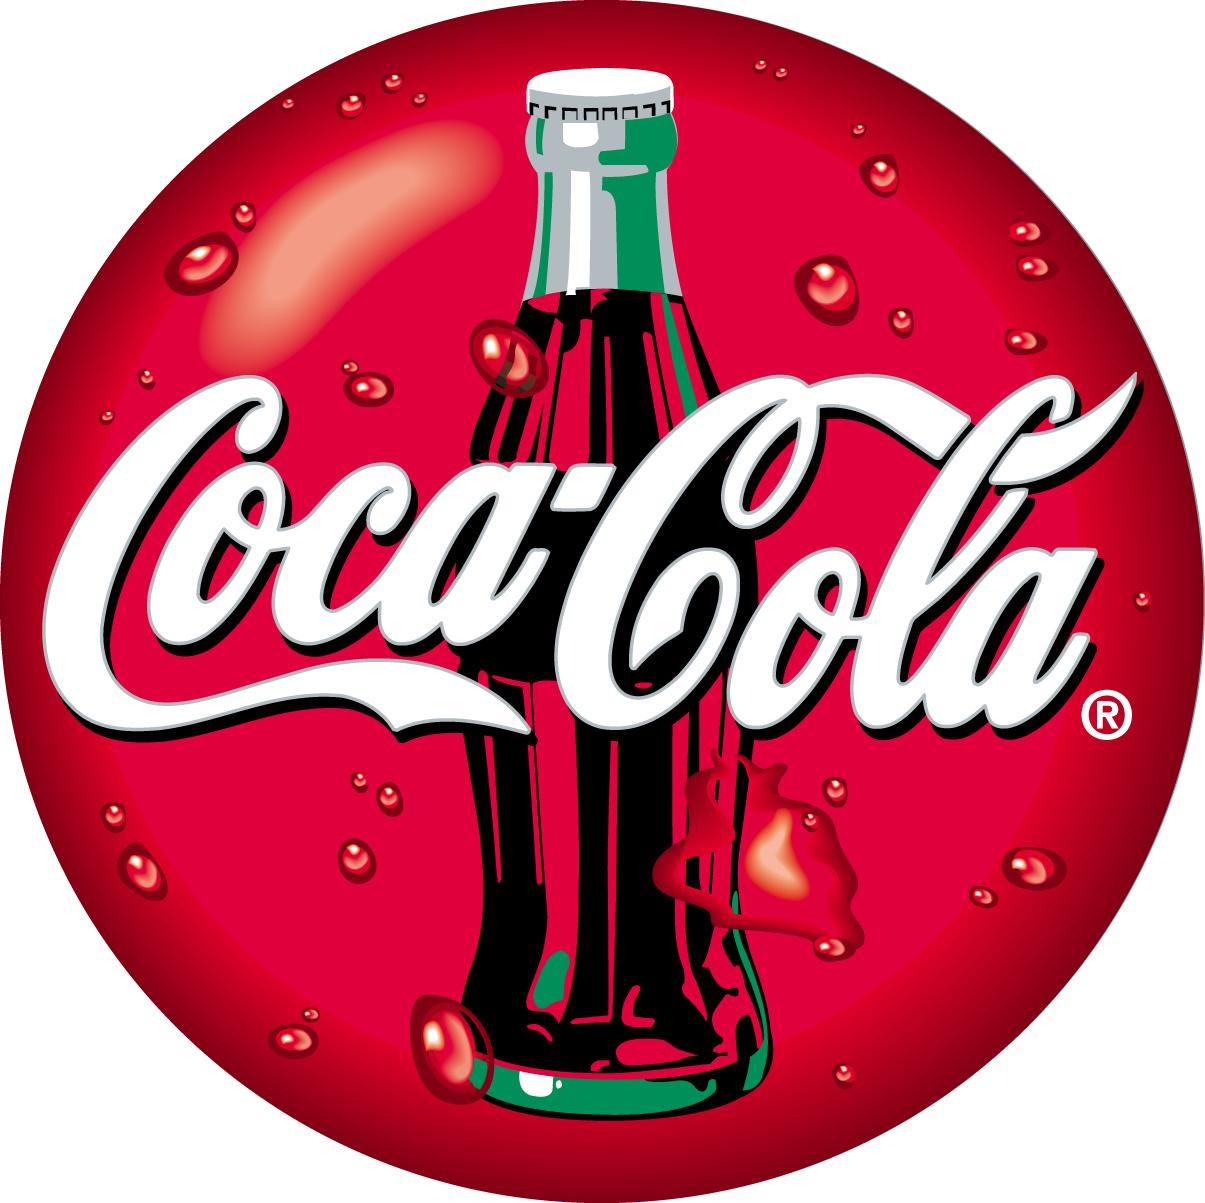 Coca Cola HD wallpapers, Desktop wallpaper - most viewed